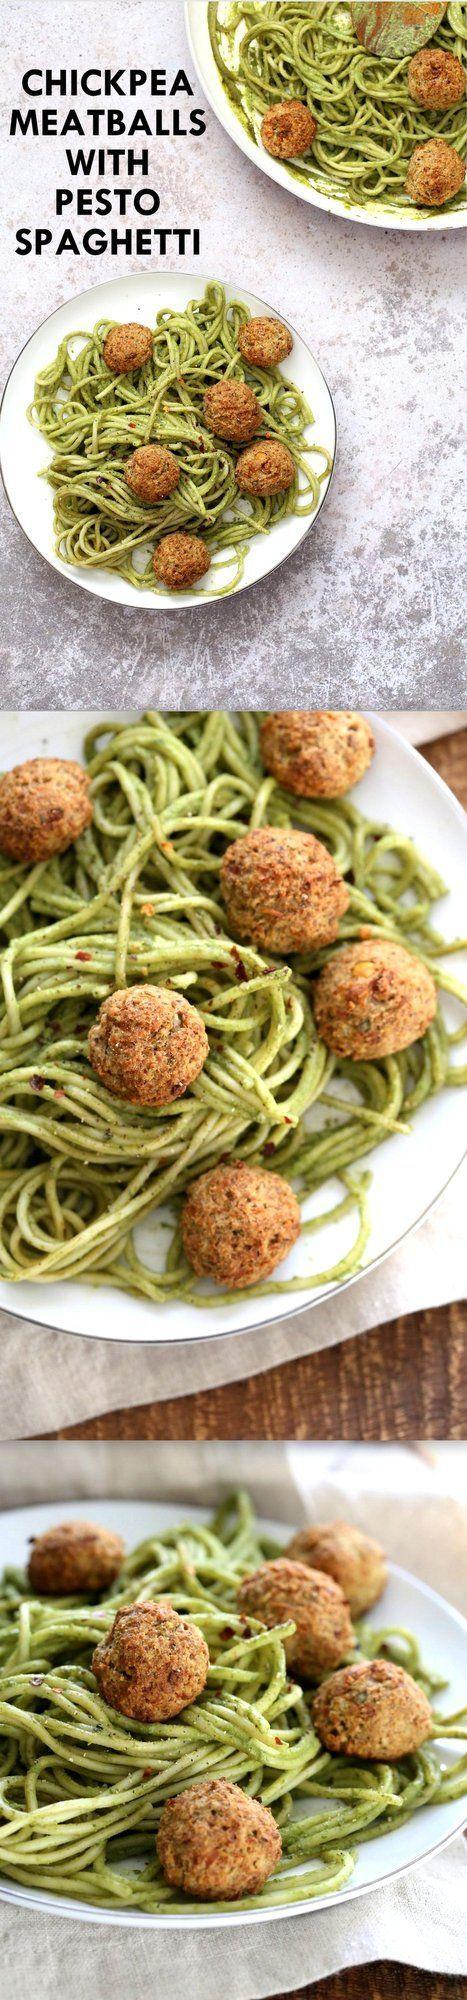 "Amazing Pesto Spaghetti with Vegan Meatballs made with Chickpeas. Vegetarian Chickpea Walnut ""meatballs"" over pesto pasta. Ready in 40 Minutes. Vegan Soyfree Recipe. Can be Glutenfree | VeganRicha.com"